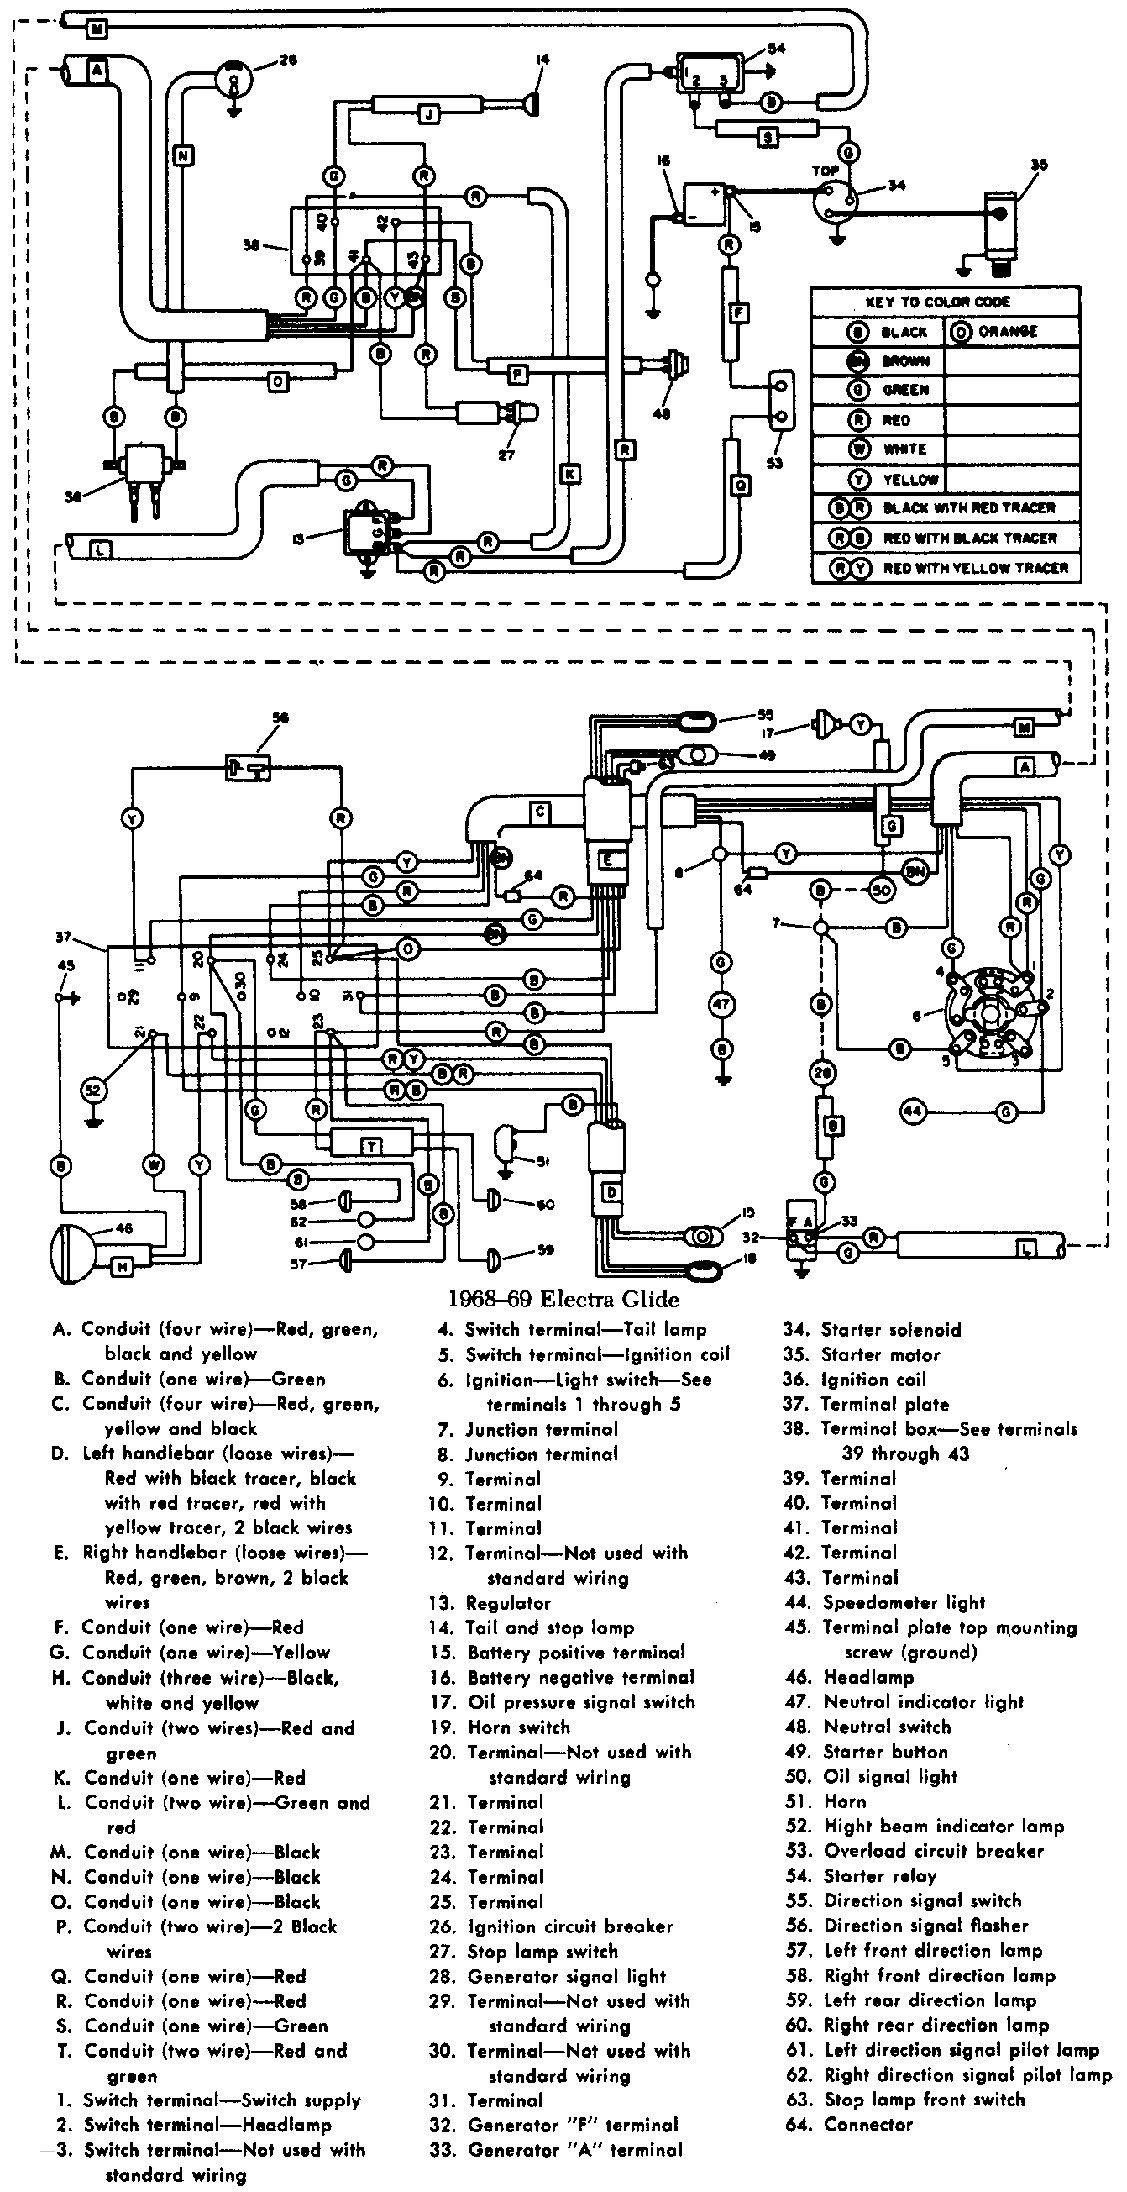 Harley Davidson Ignition Switch Wiring Diagram In